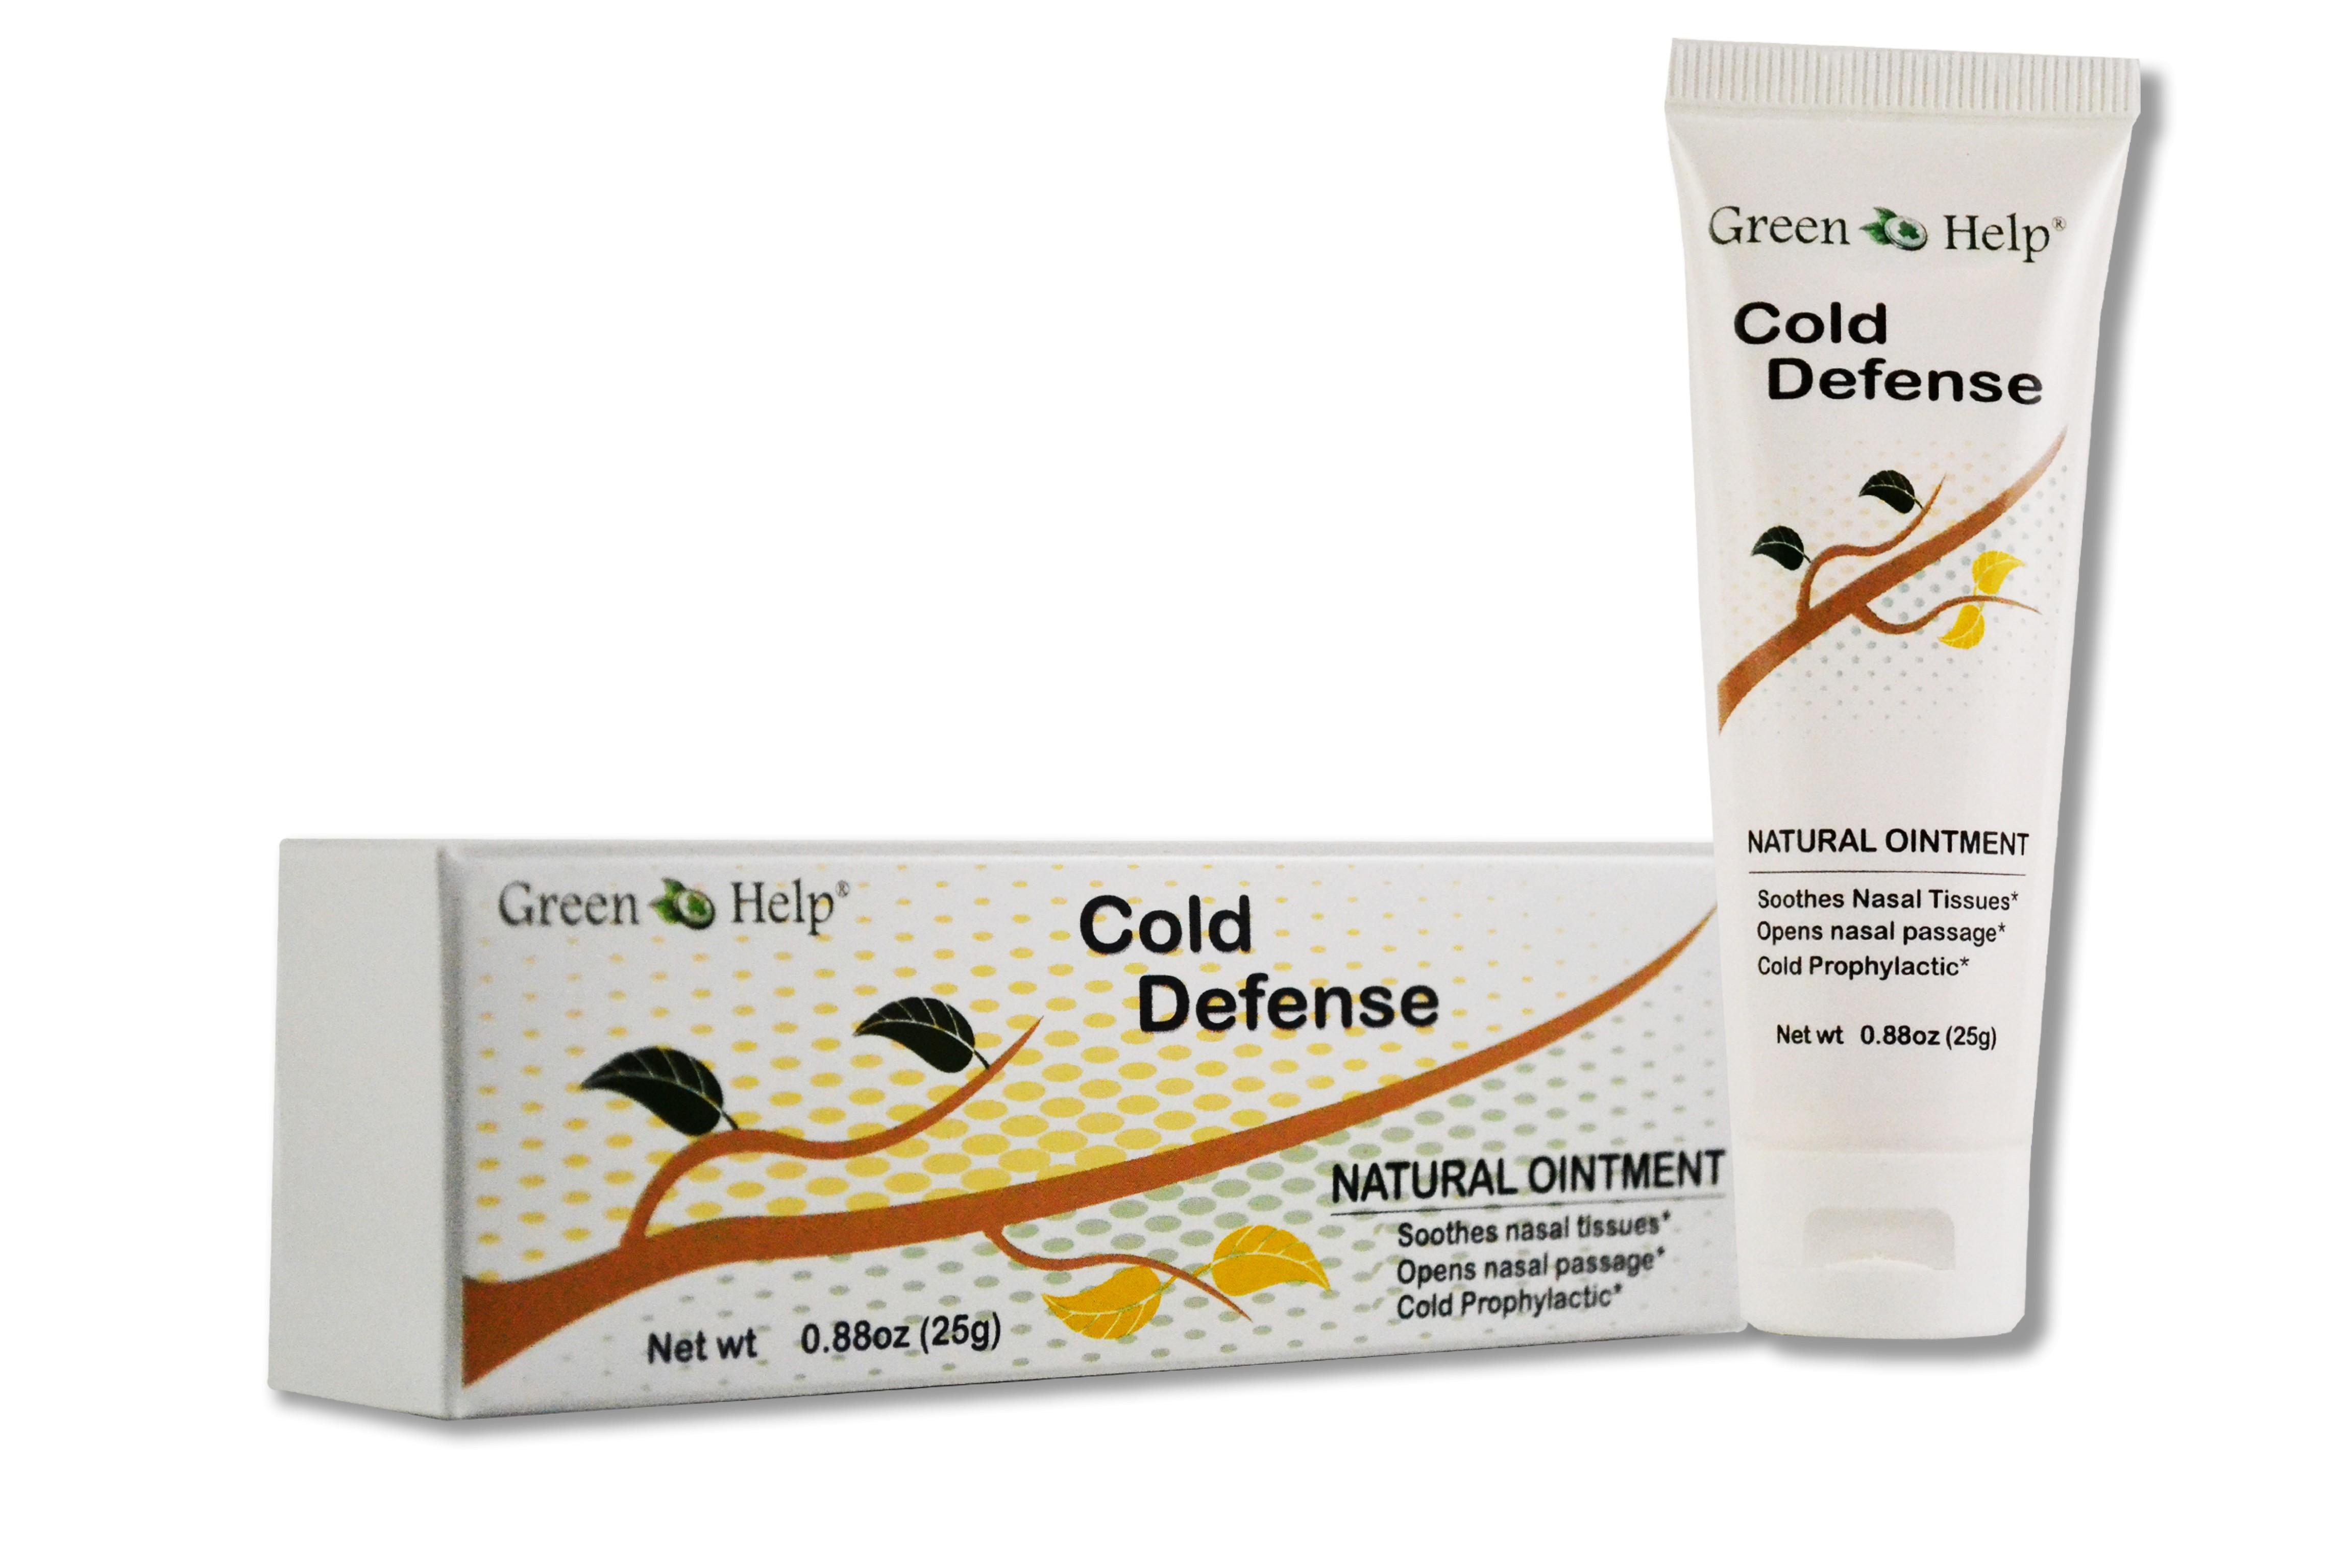 Cold Defense Cream 1.8 oz (25 gr) Green Help